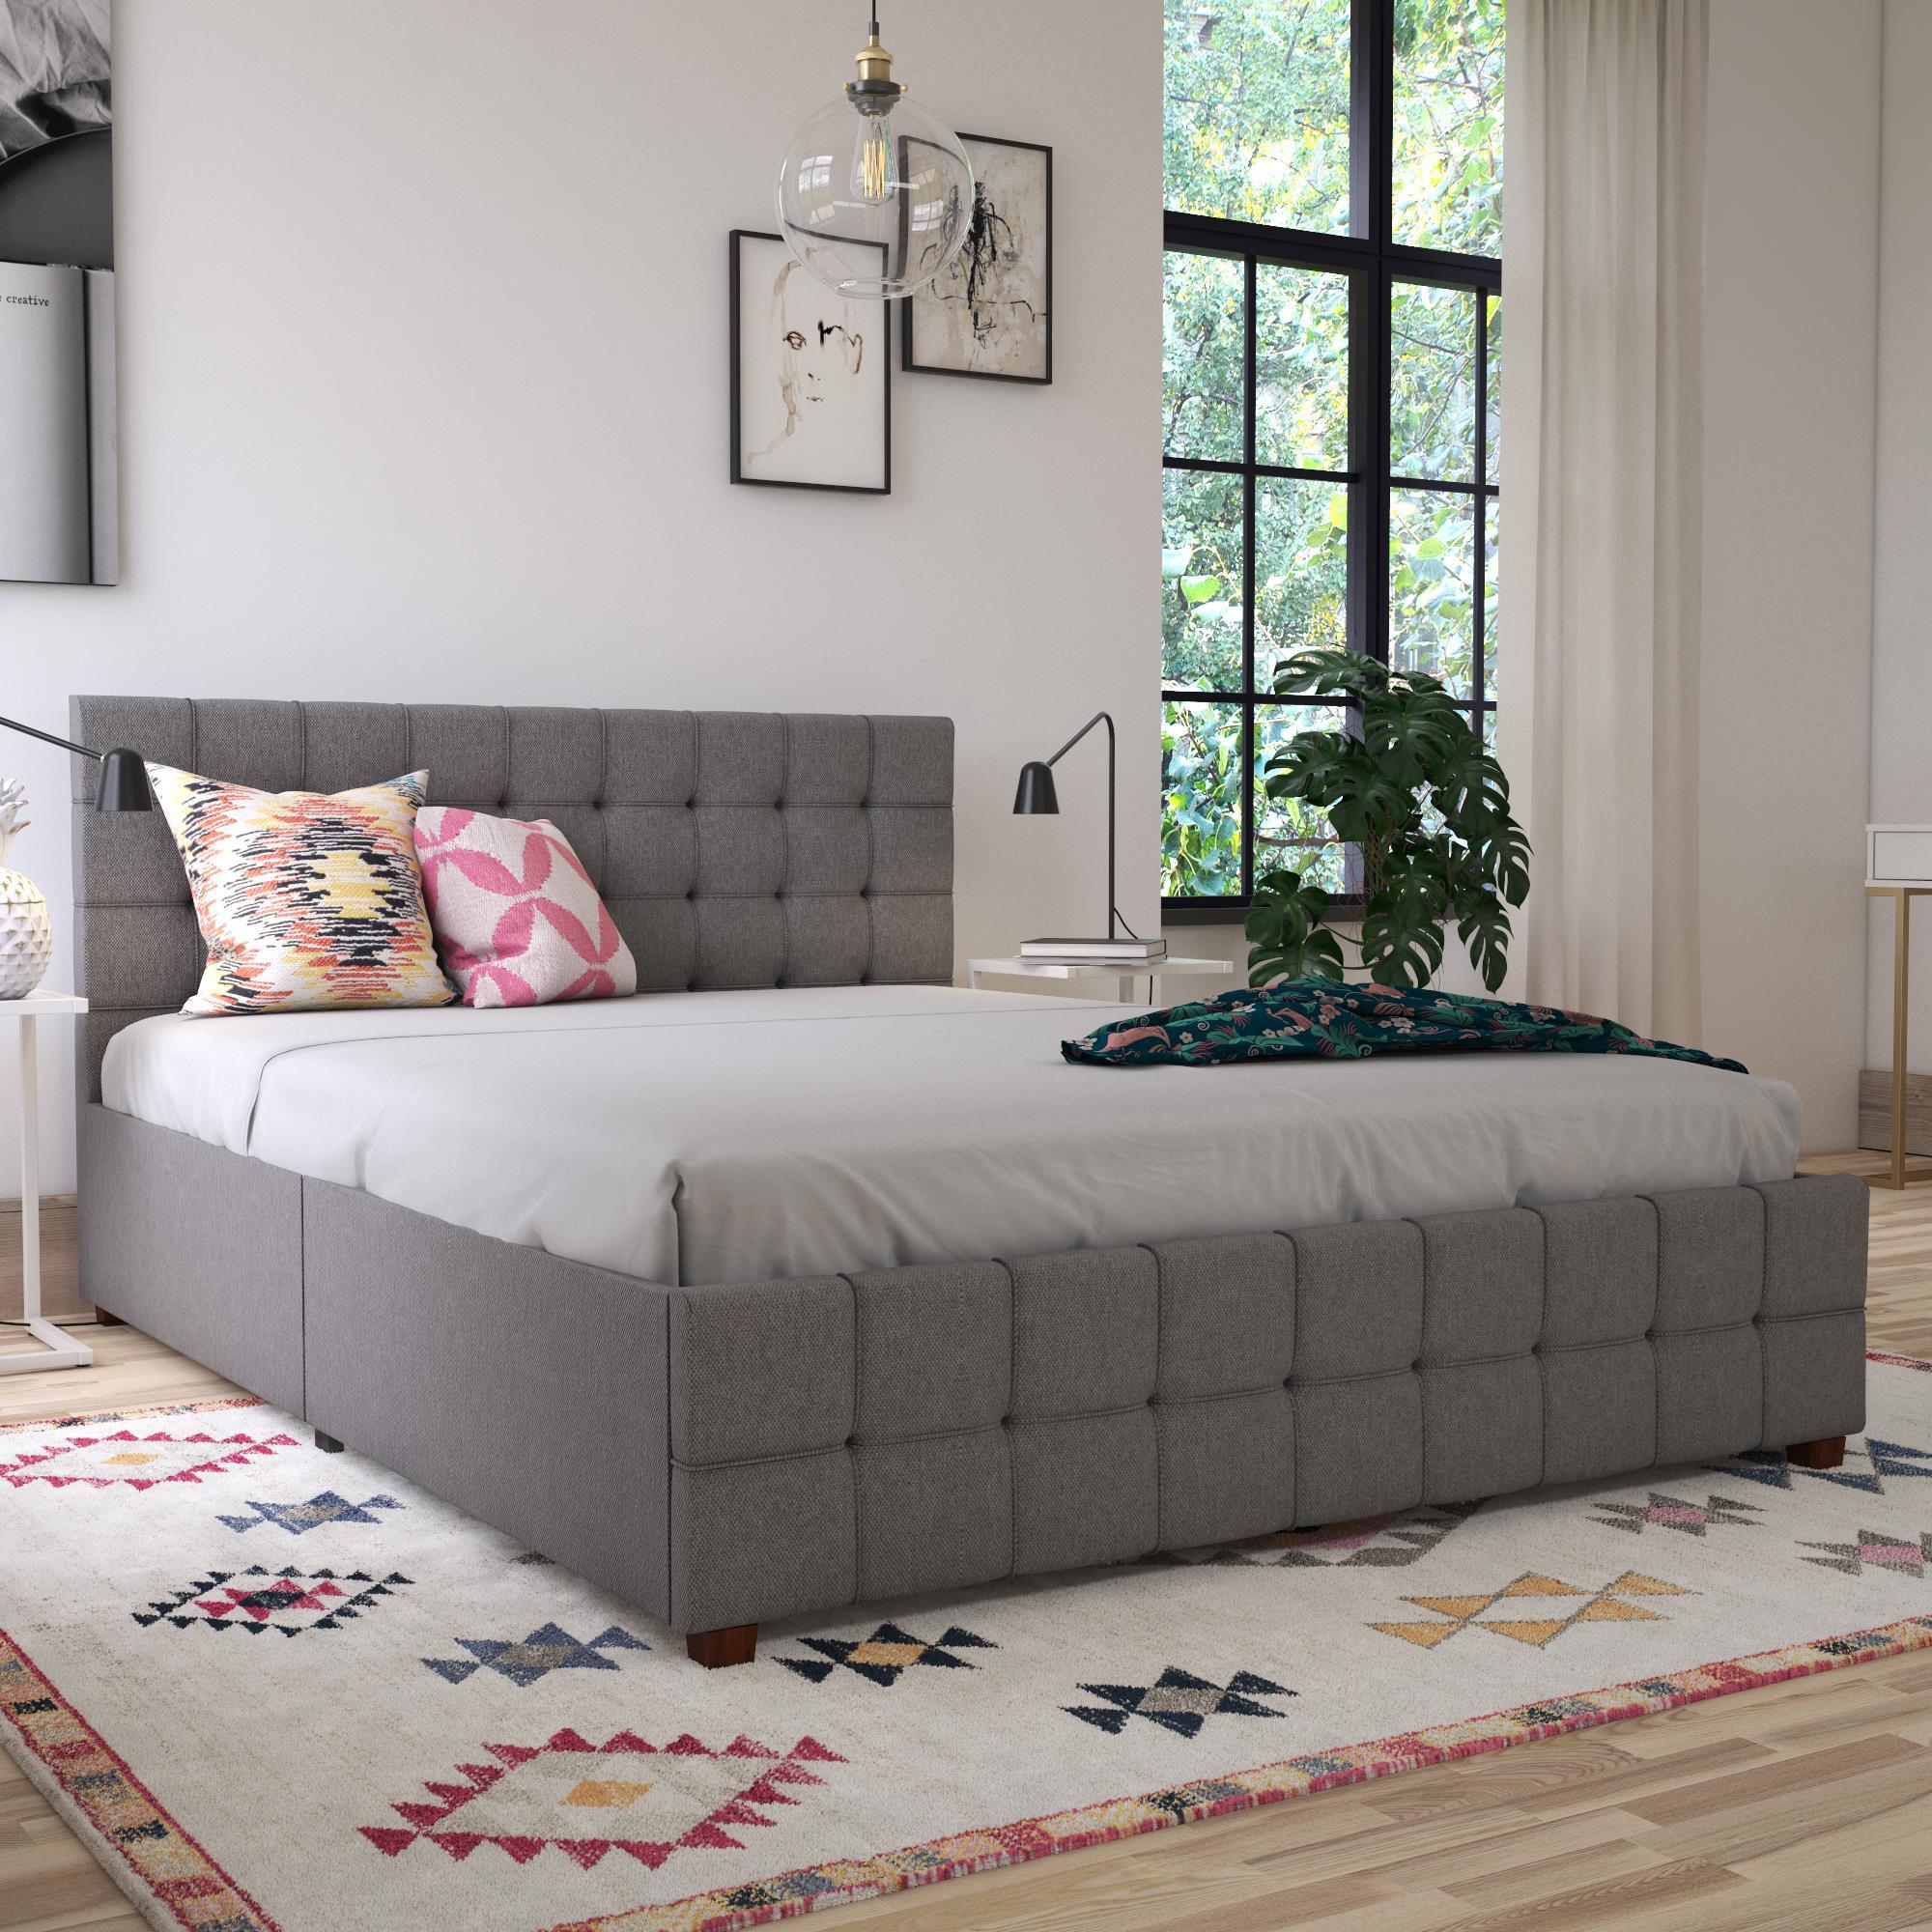 Cosmoliving By Cosmopolitan Elizabeth Tufted Upholstered Low Profile Storage Platform Bed Reviews